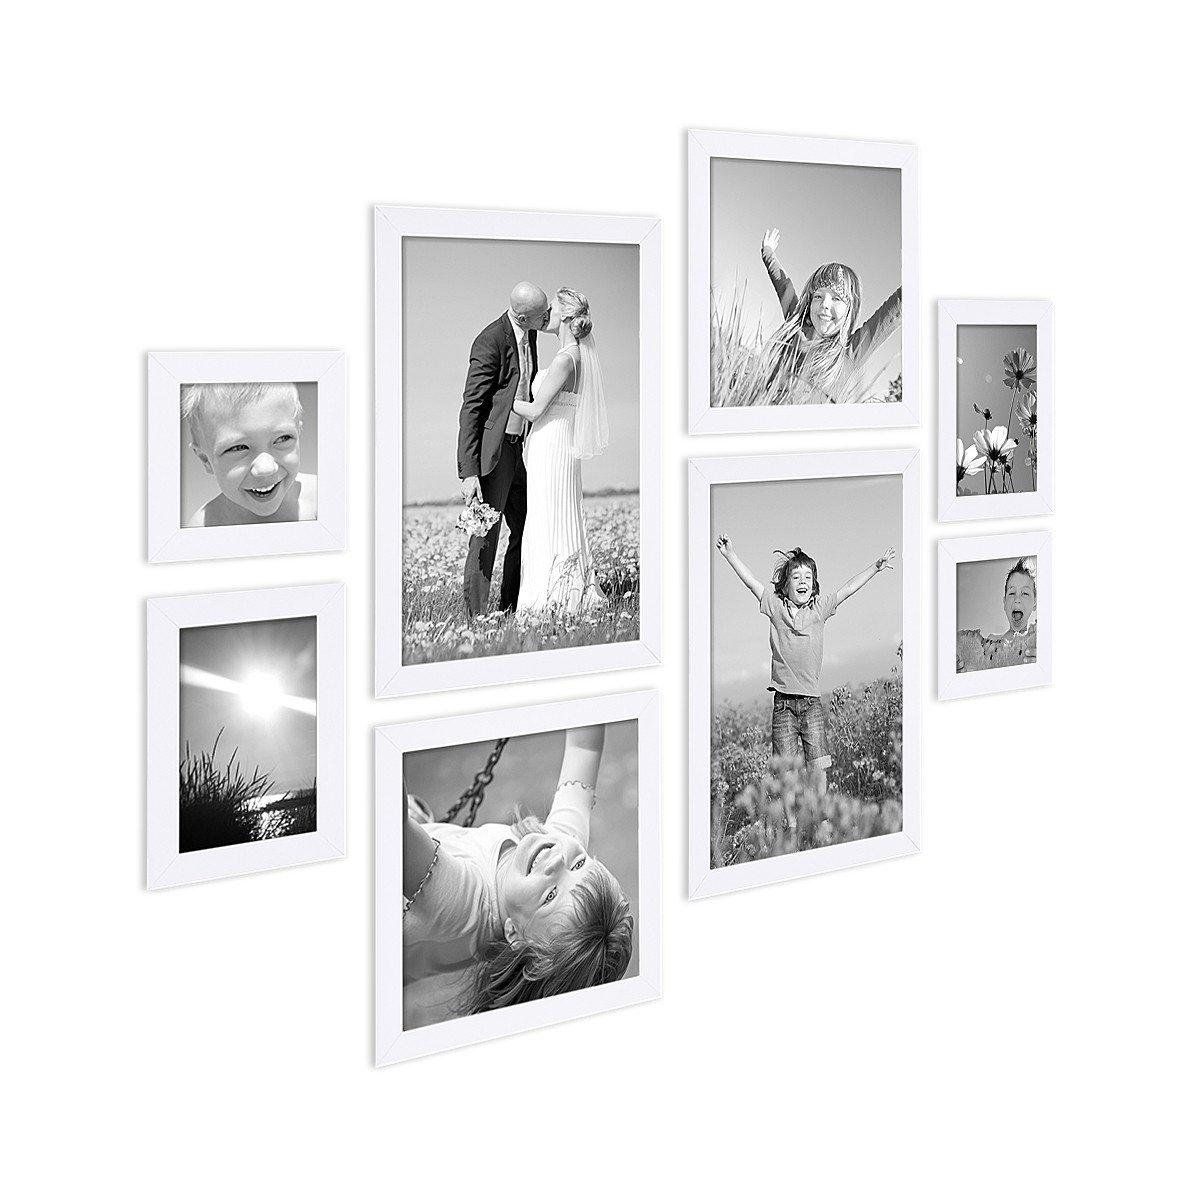 8er-Set Bilderrahmen Weiss Modern aus MDF je 2 mal 10x10 10x15 20x20 ...